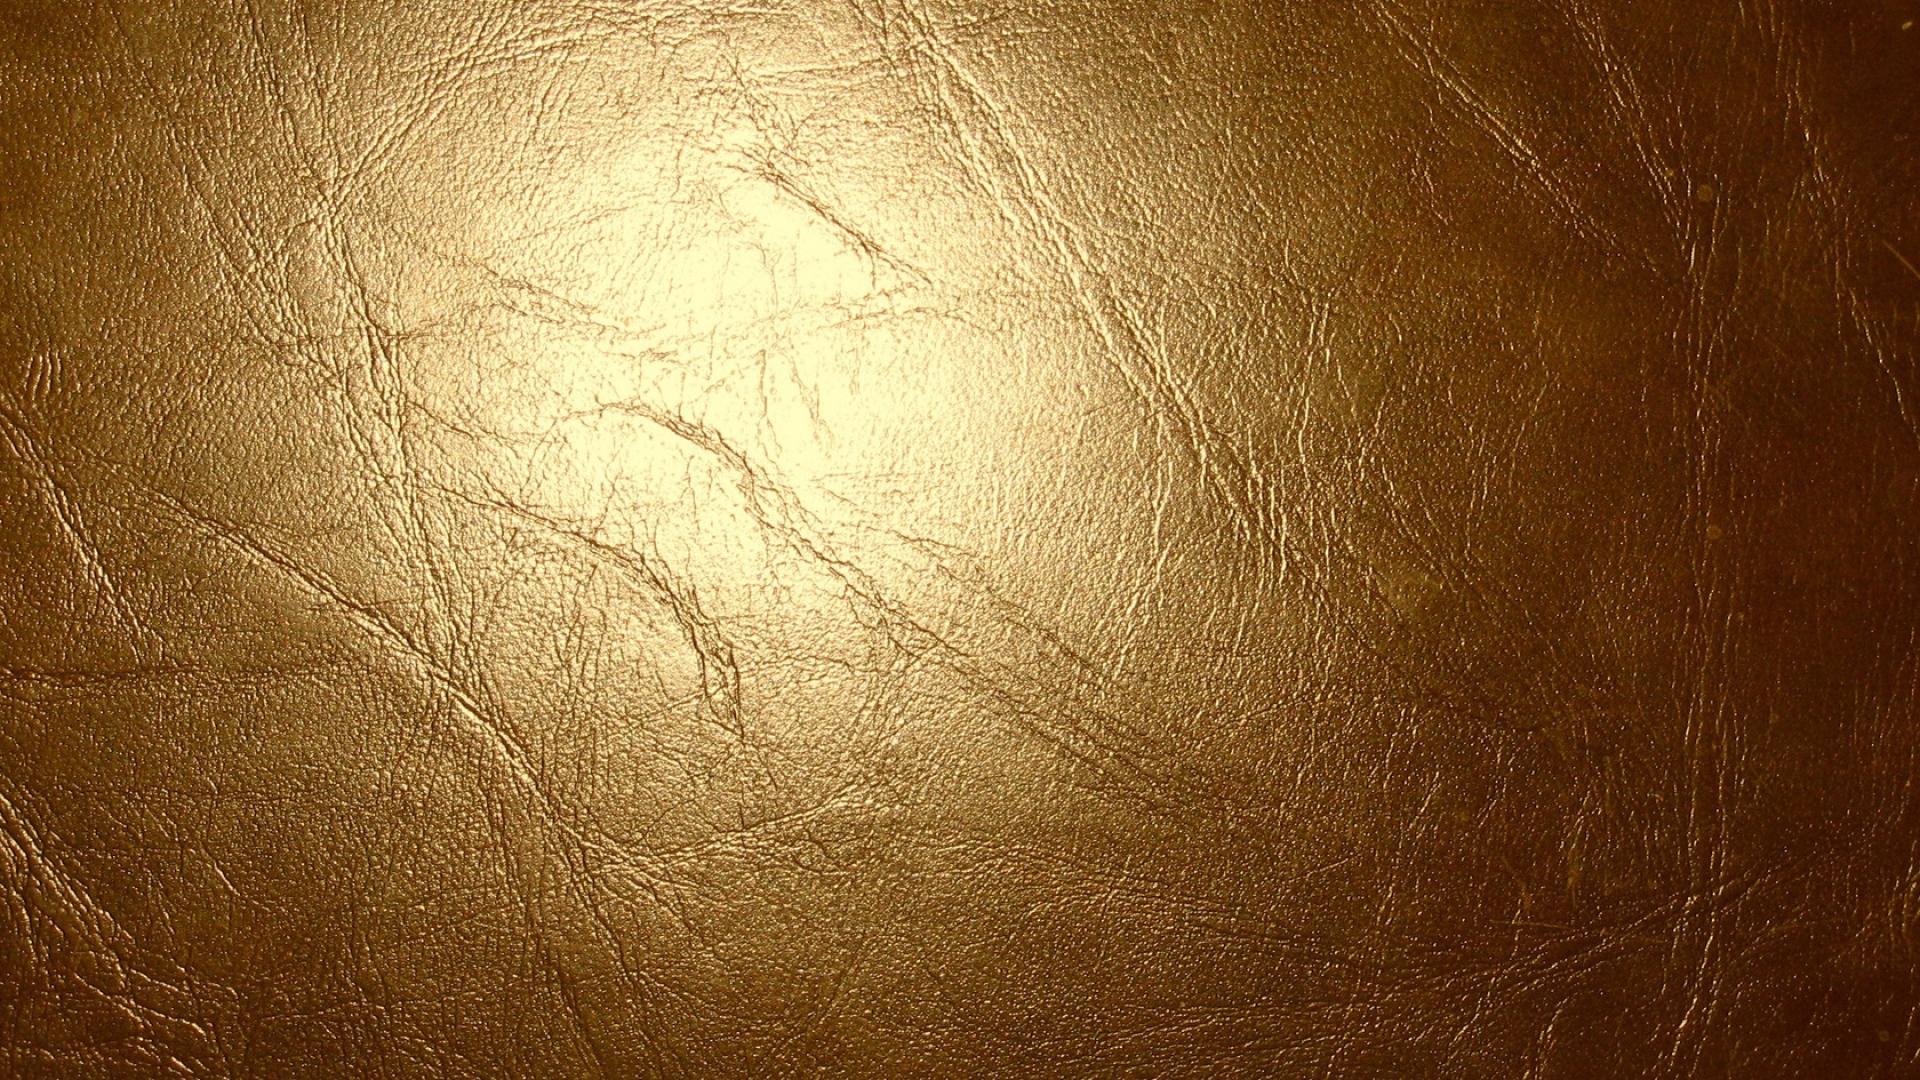 Download Wallpaper 1920x1080 Leather Gold Glitter Cracks Texture